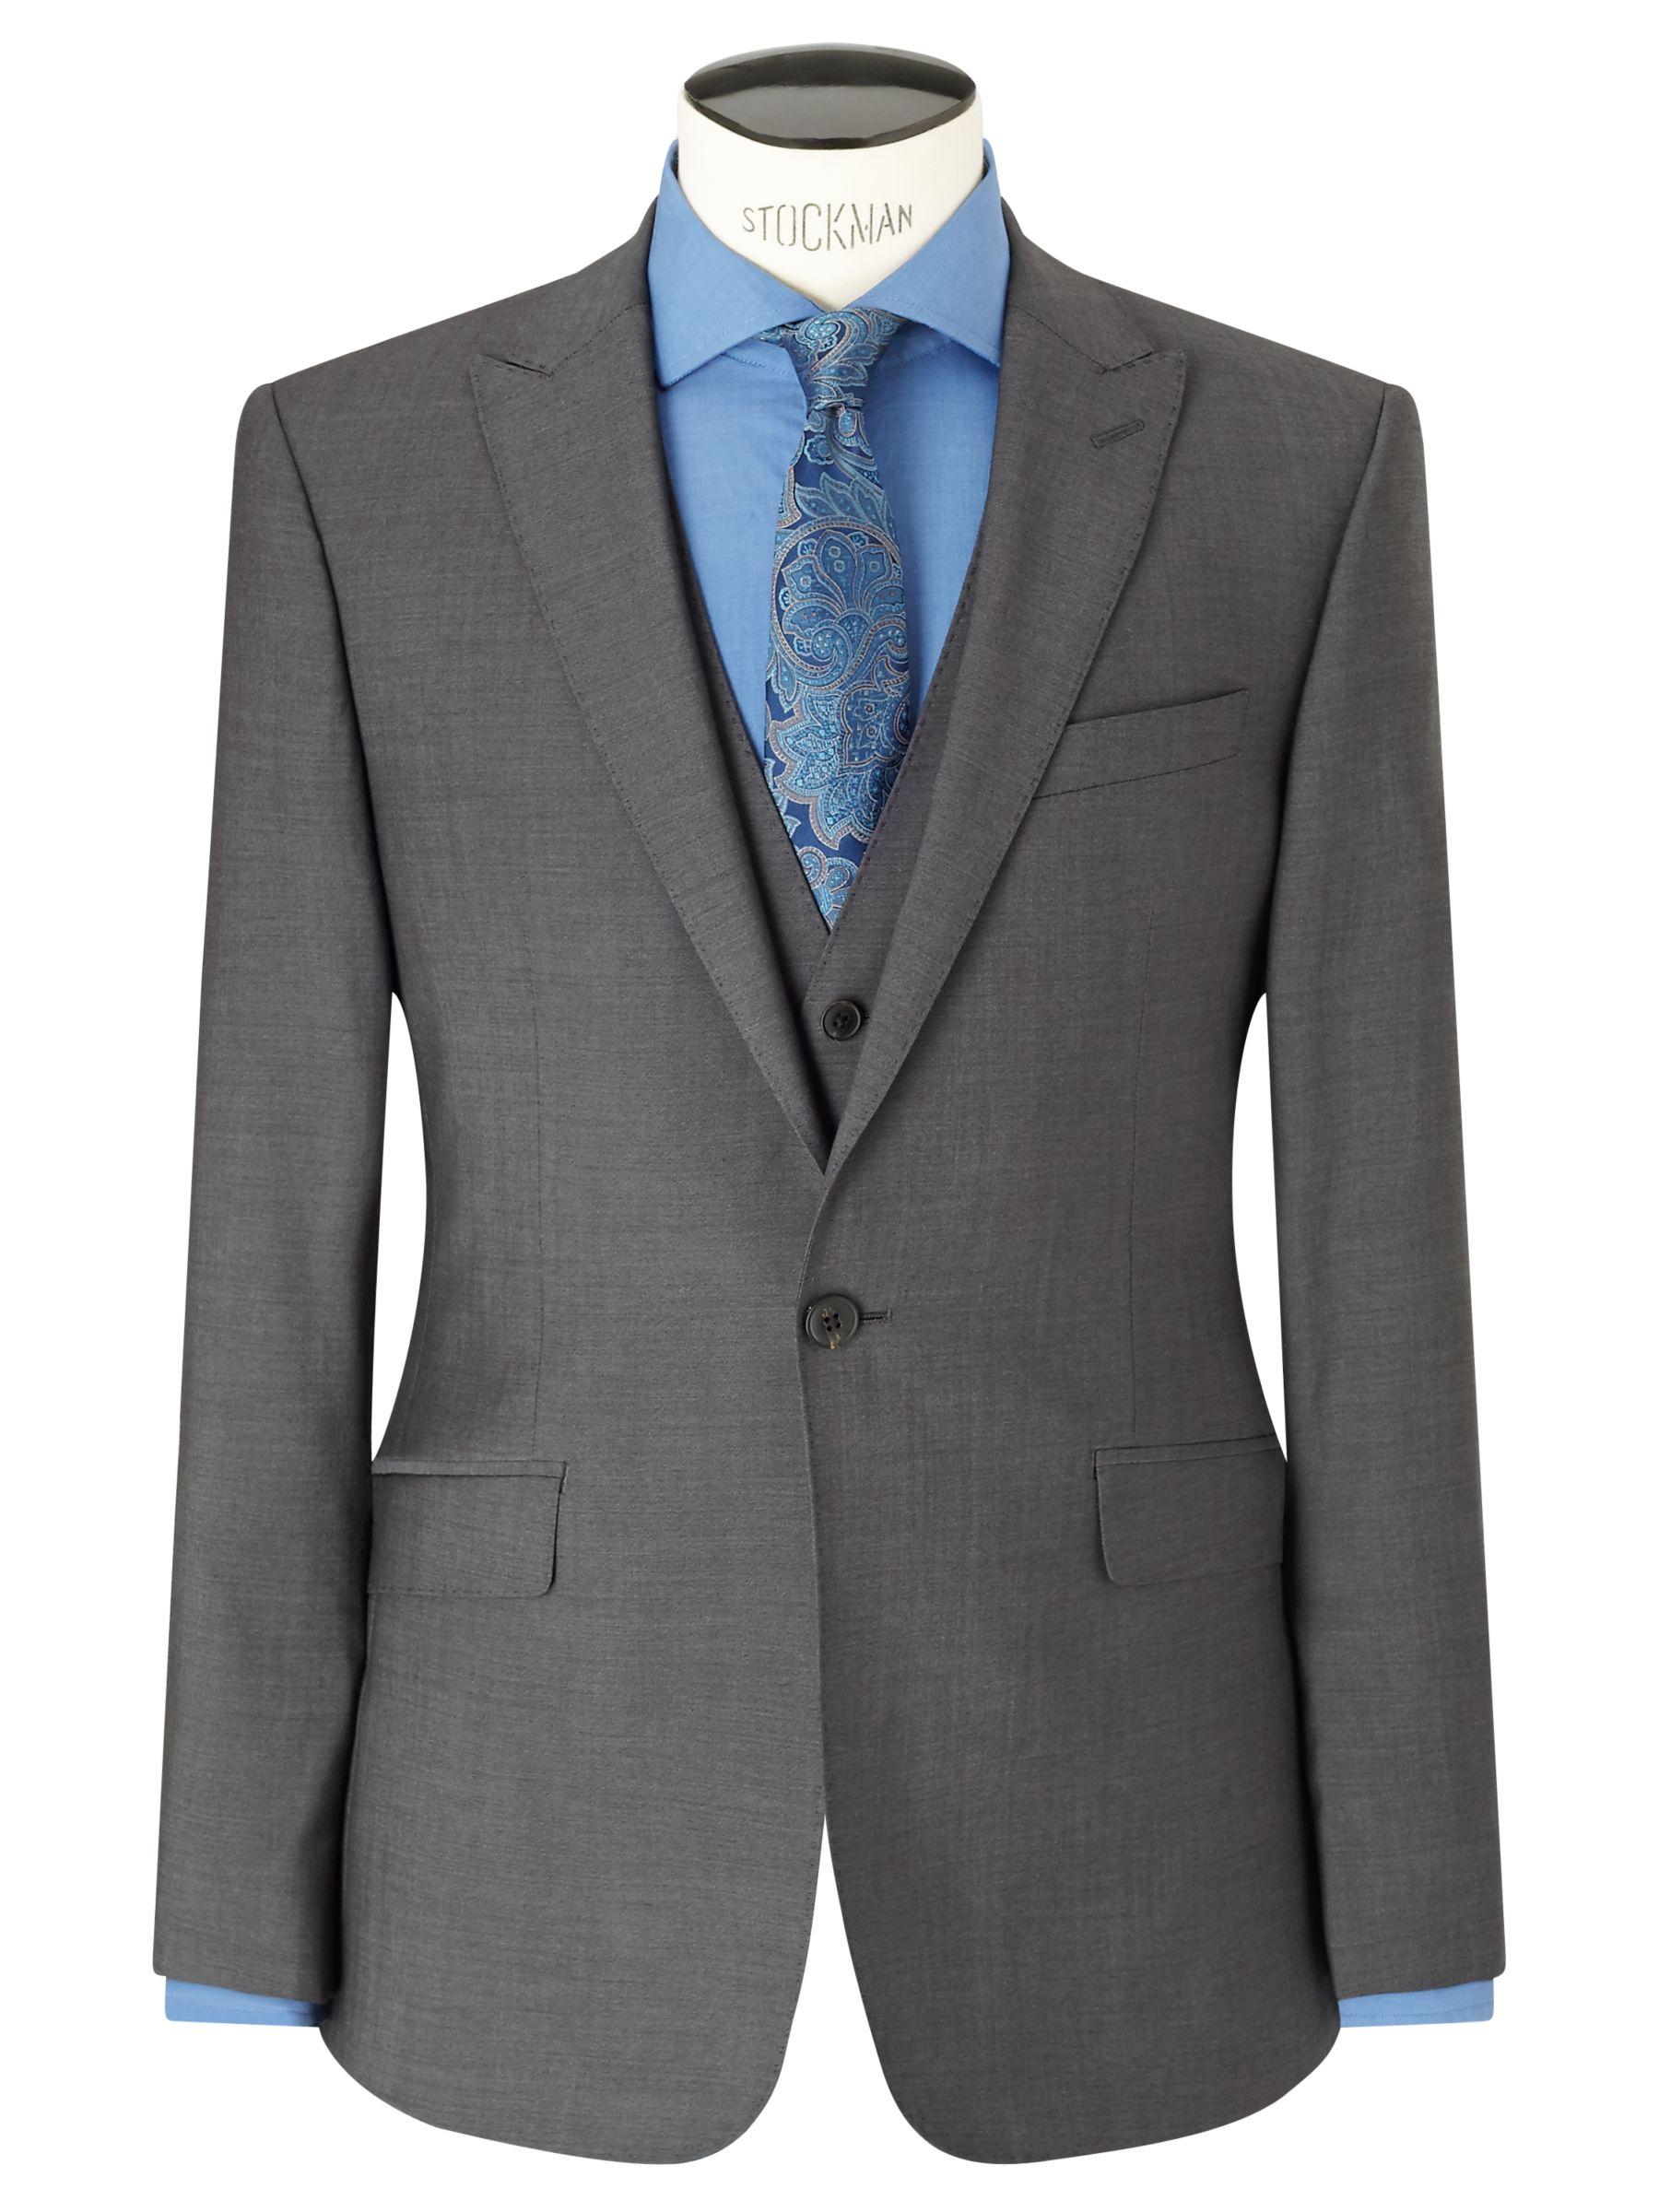 Richard James Mayfair Richard James Mayfair Tonic Sheen Slim Suit Jacket, Charcoal